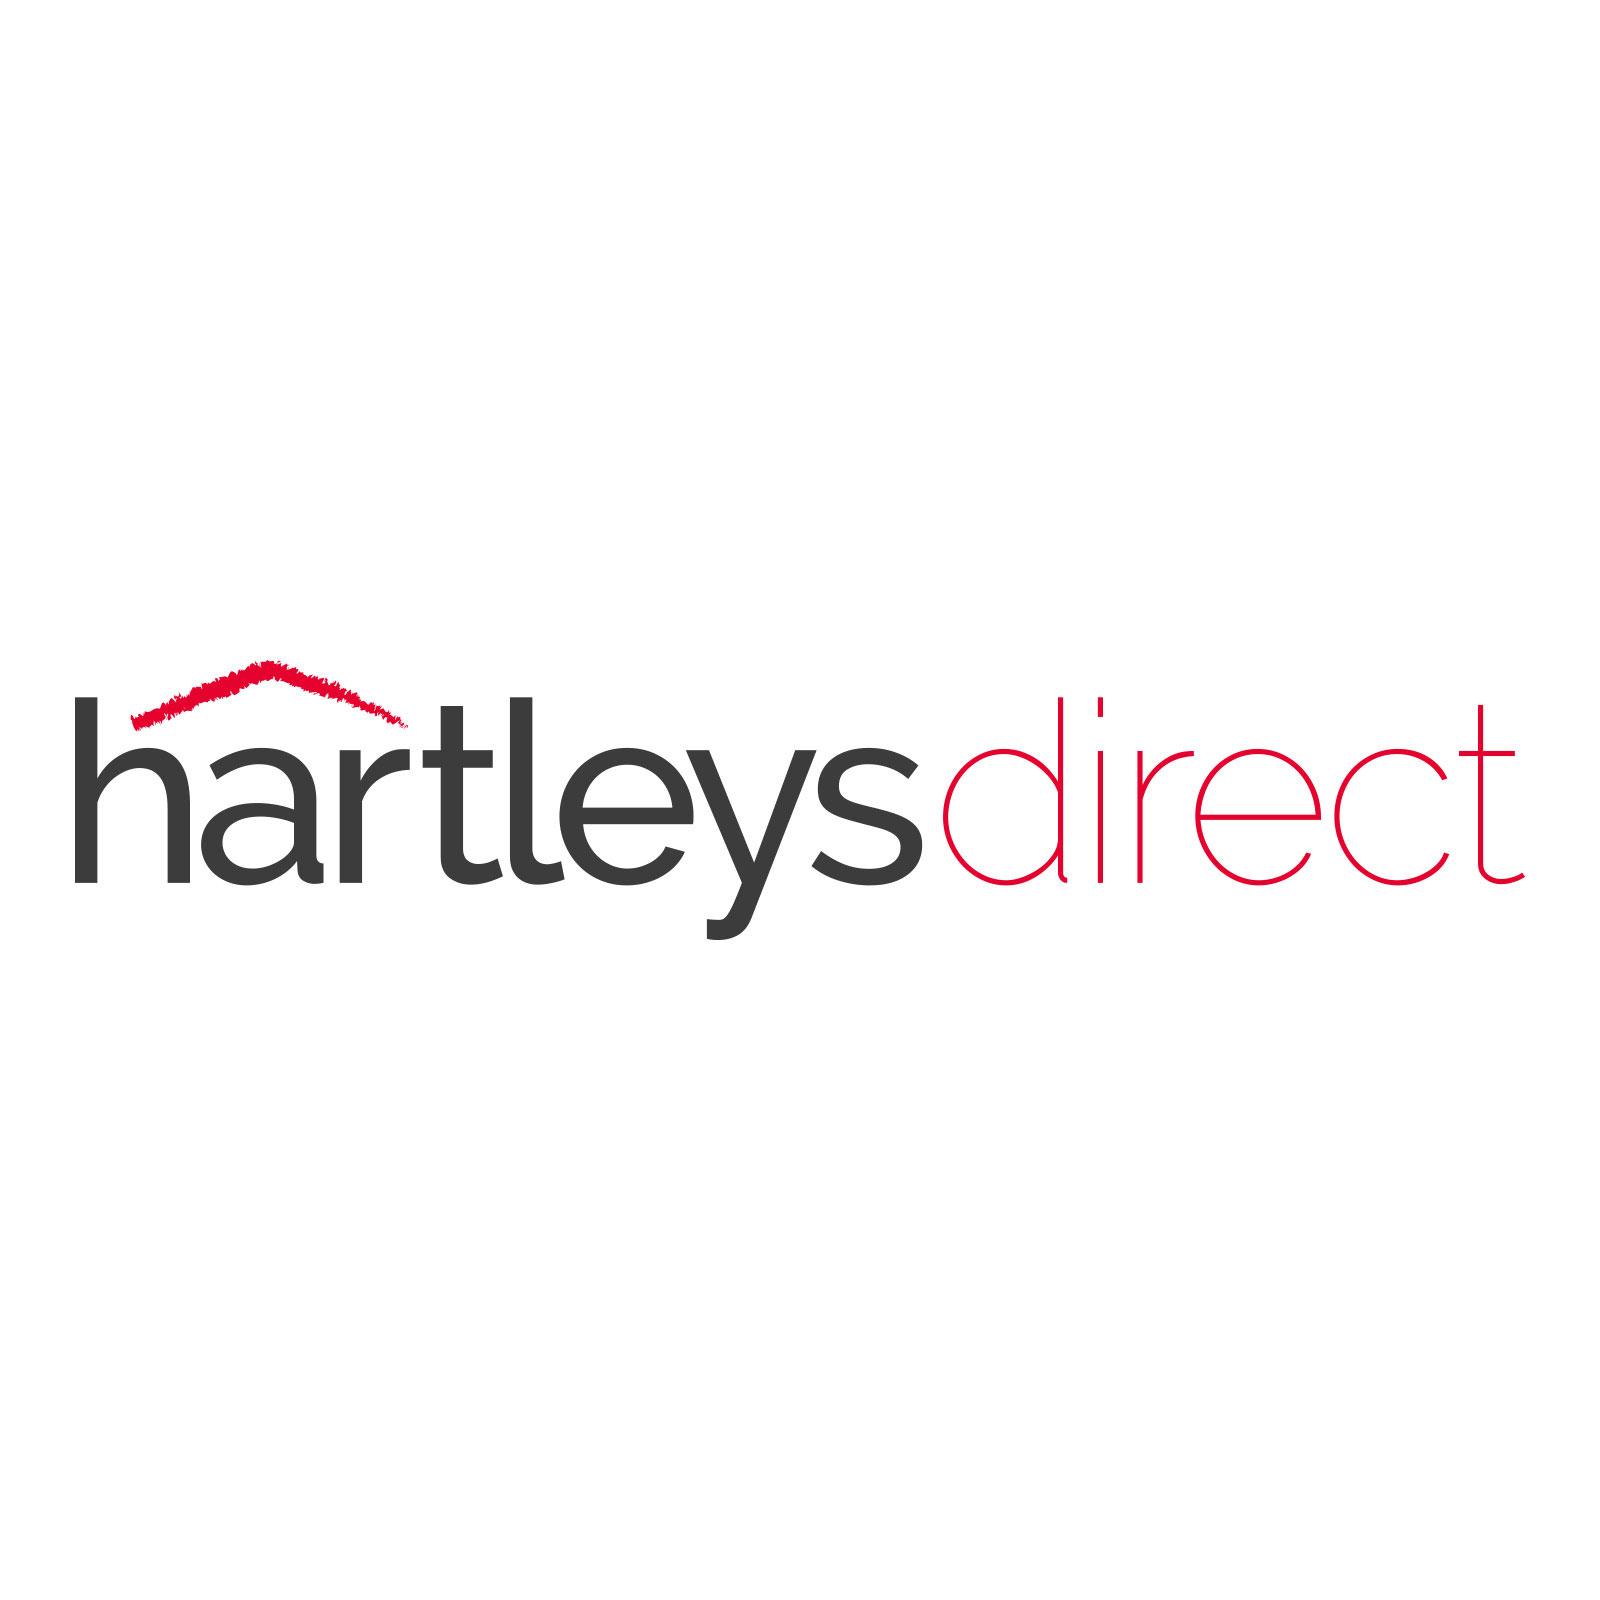 Hartleys-27-inch-Chrome-Office-Chair-Base-on-White-Background.jpg